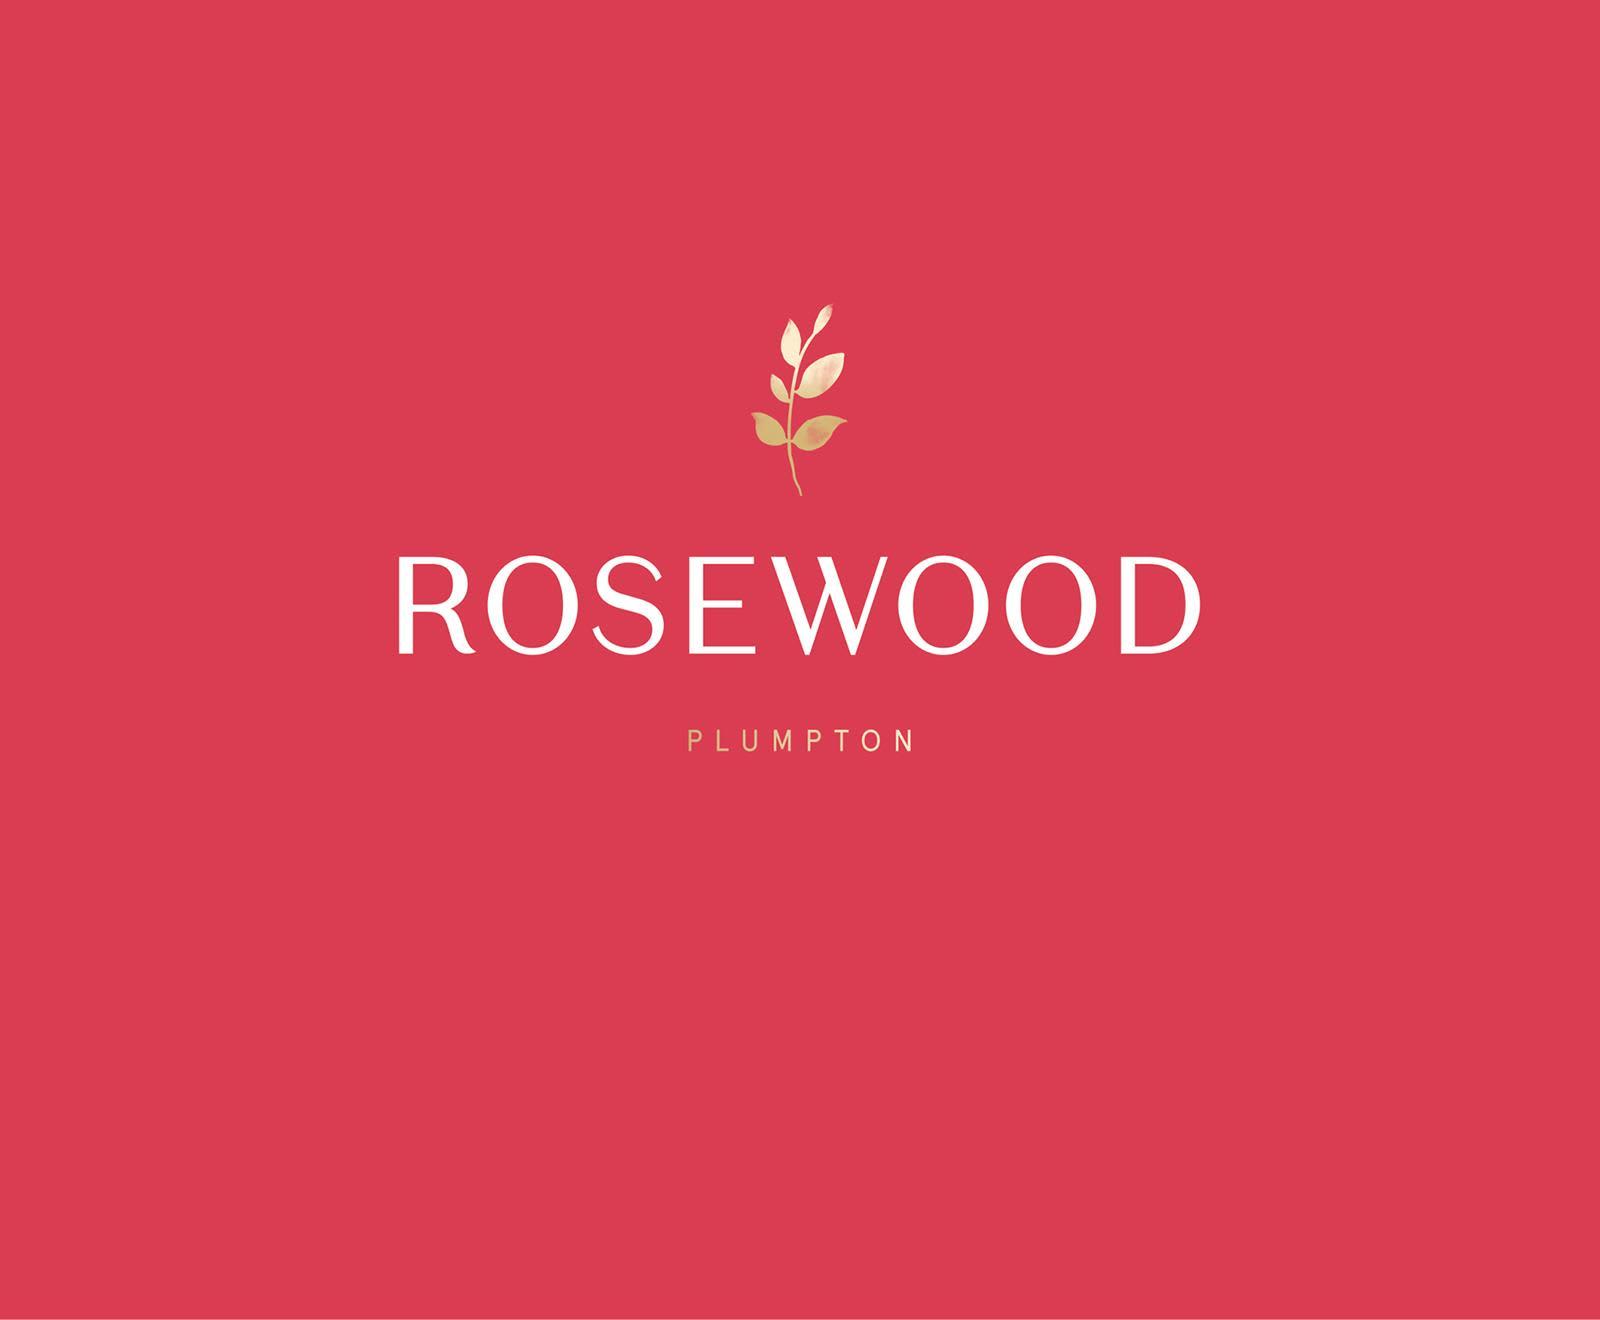 Rosewood – Plumpton